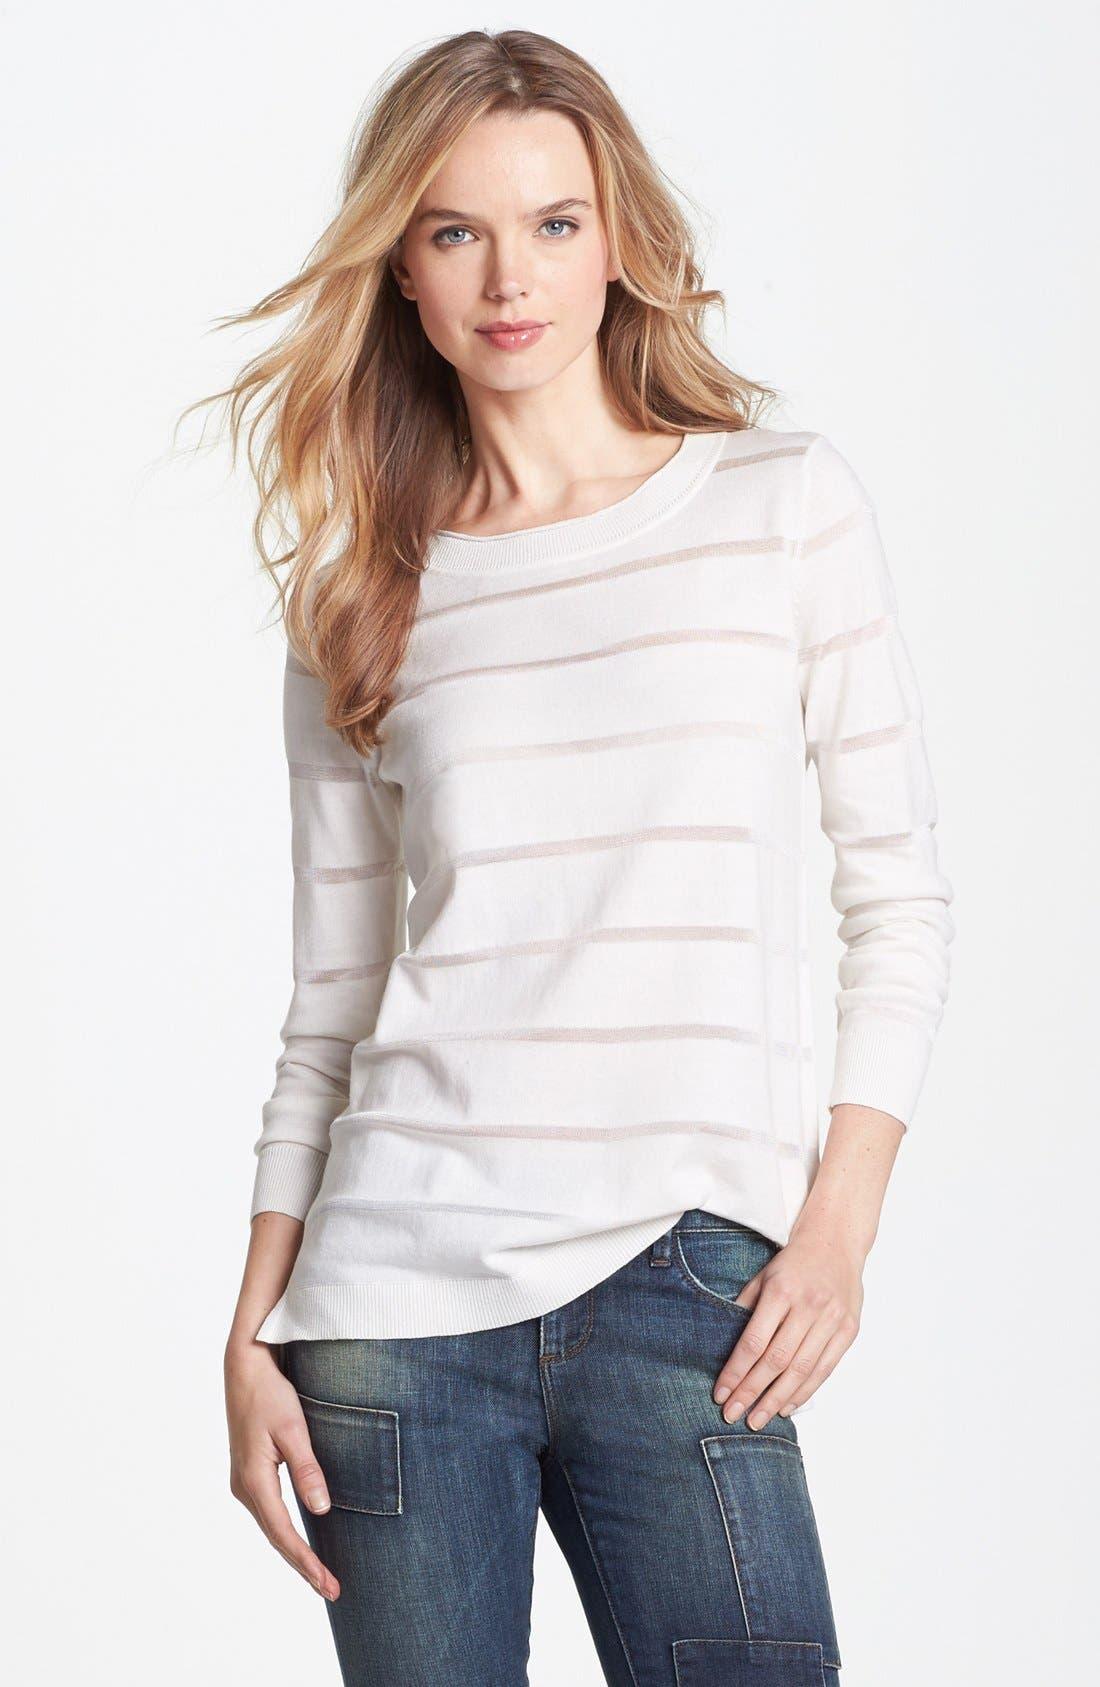 Alternate Image 1 Selected - Vince Camuto Illusion Stripe Sweater (Regular & Petite)